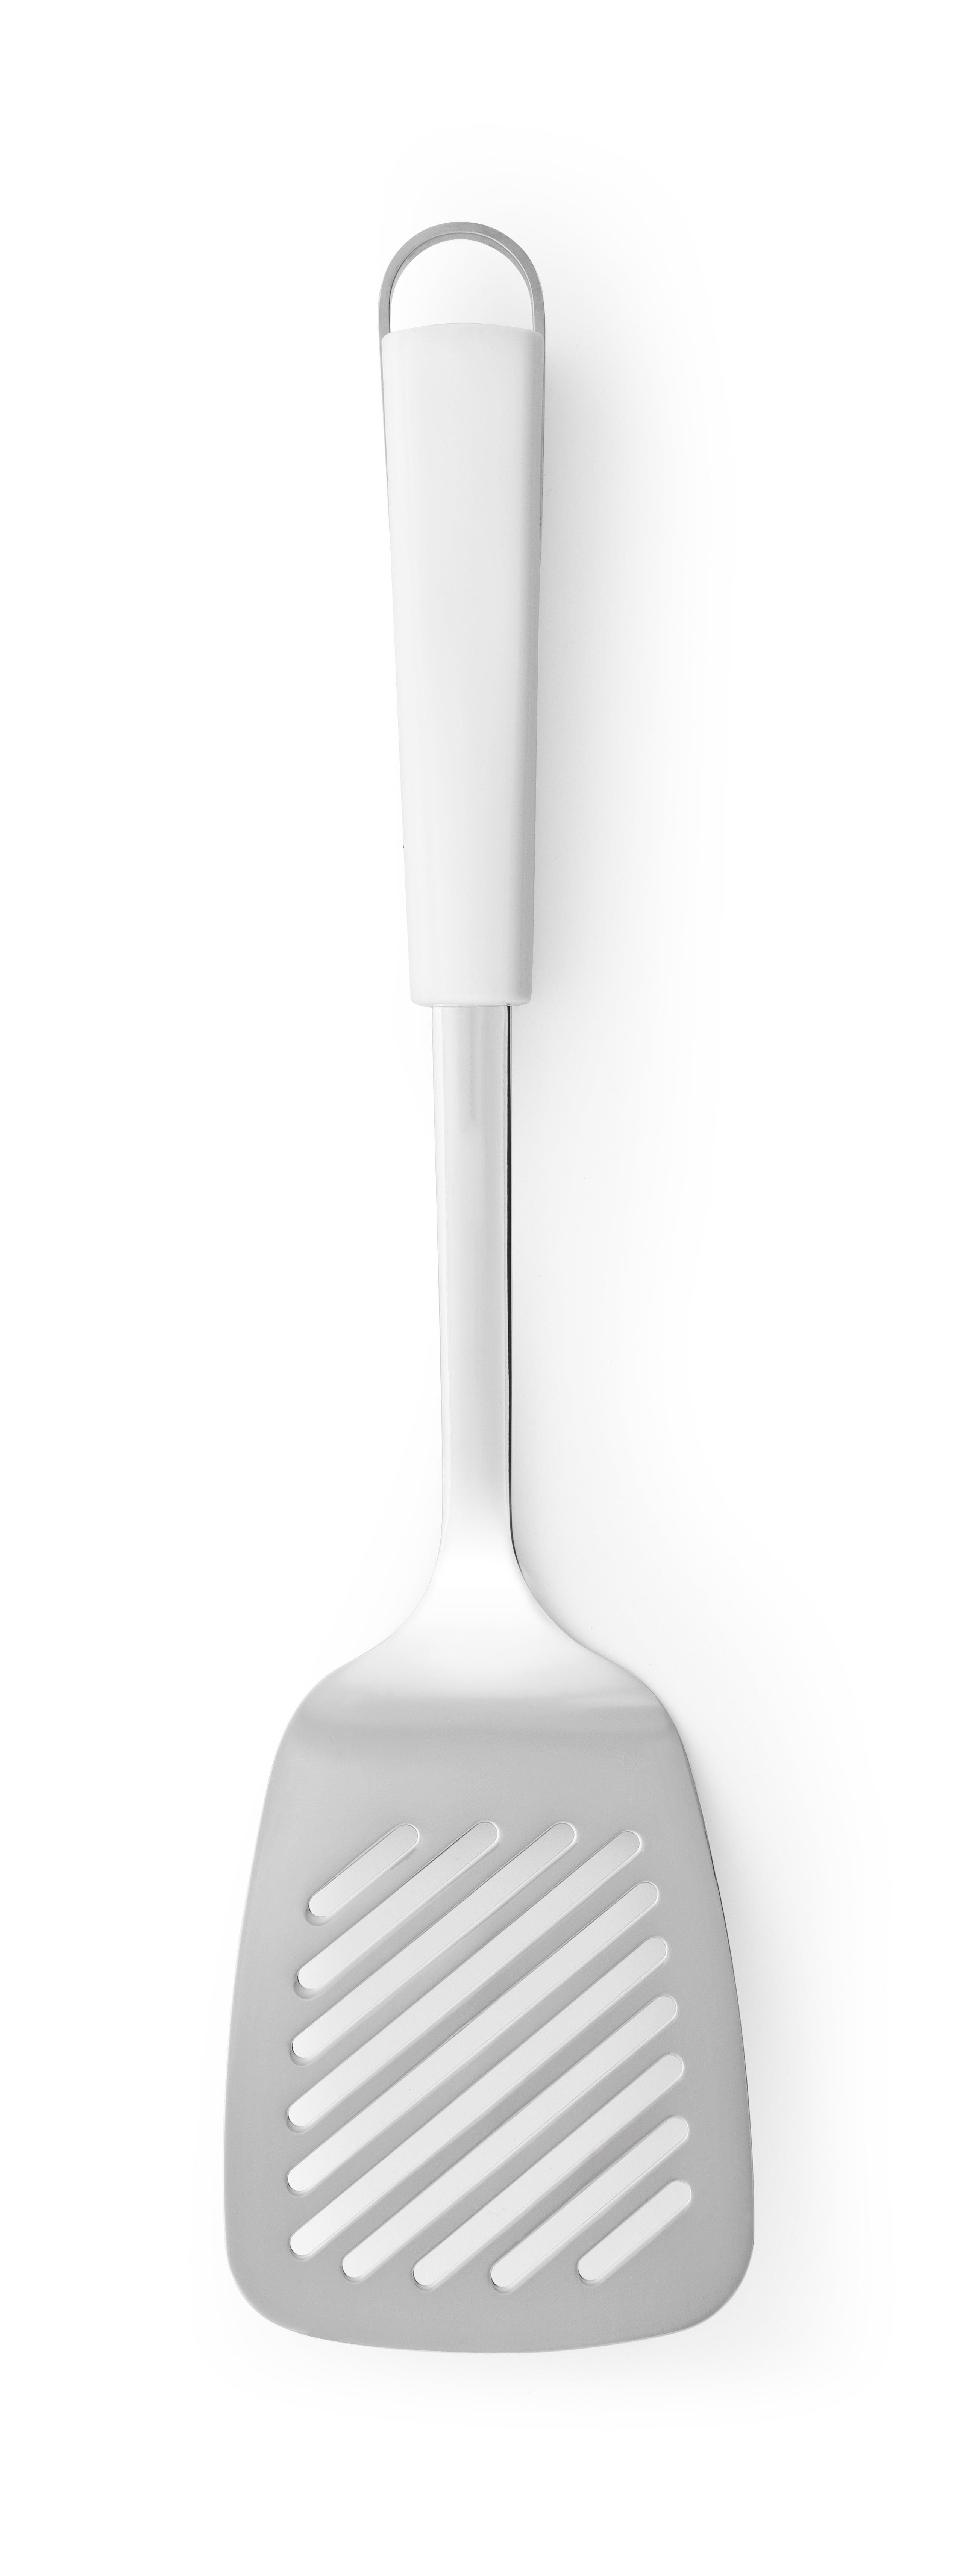 BRABANTIA Σπάτουλα Τρυπητή Ανοξείδωτη με Λευκή Λαβή ESSENTIAL LINE - 080.4005/44